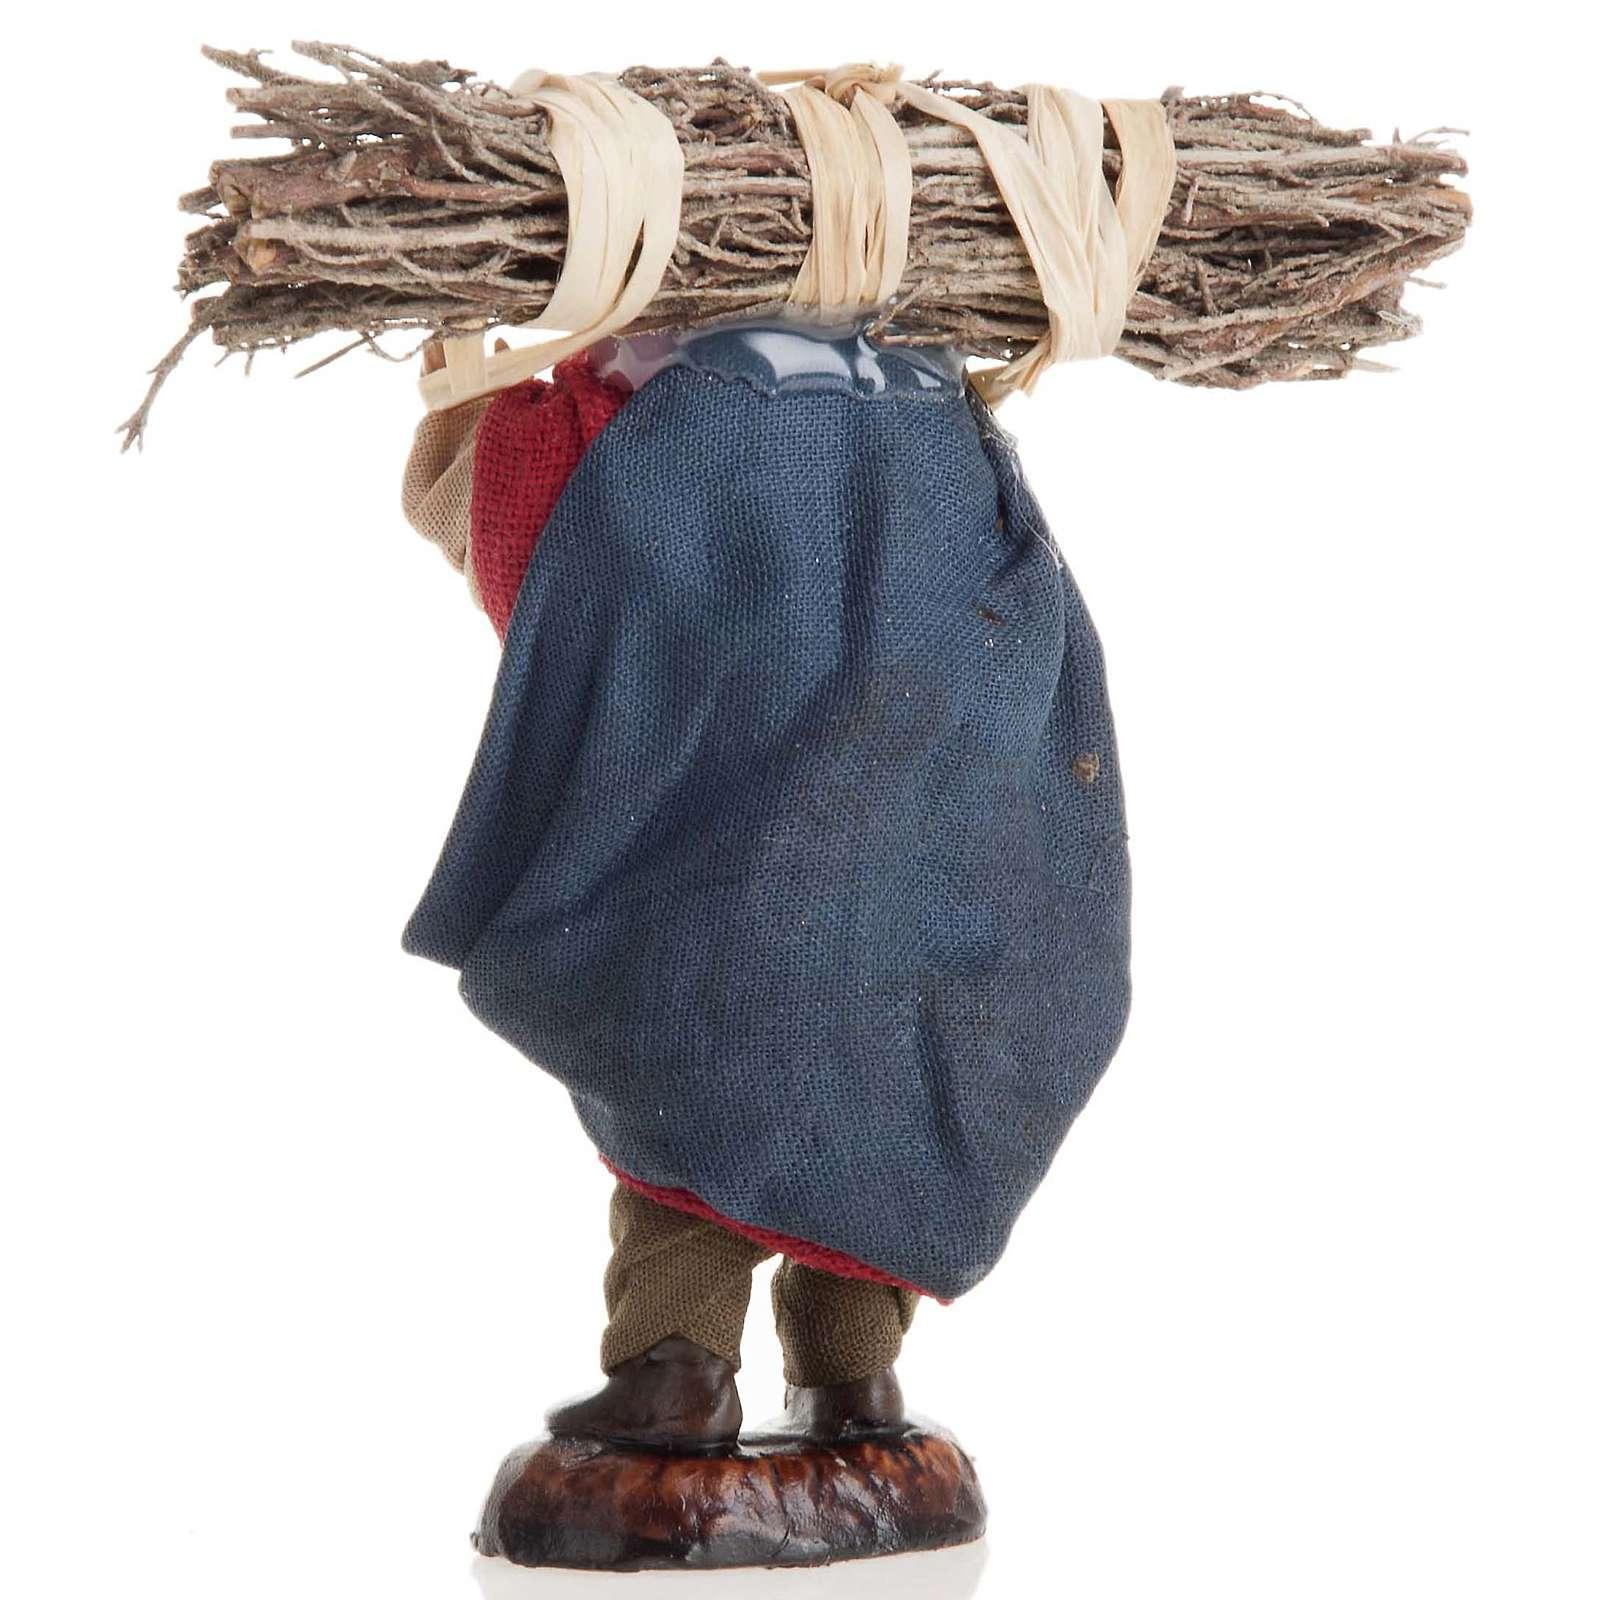 Neapolitan nativity figurine, old woodman 8cm 4